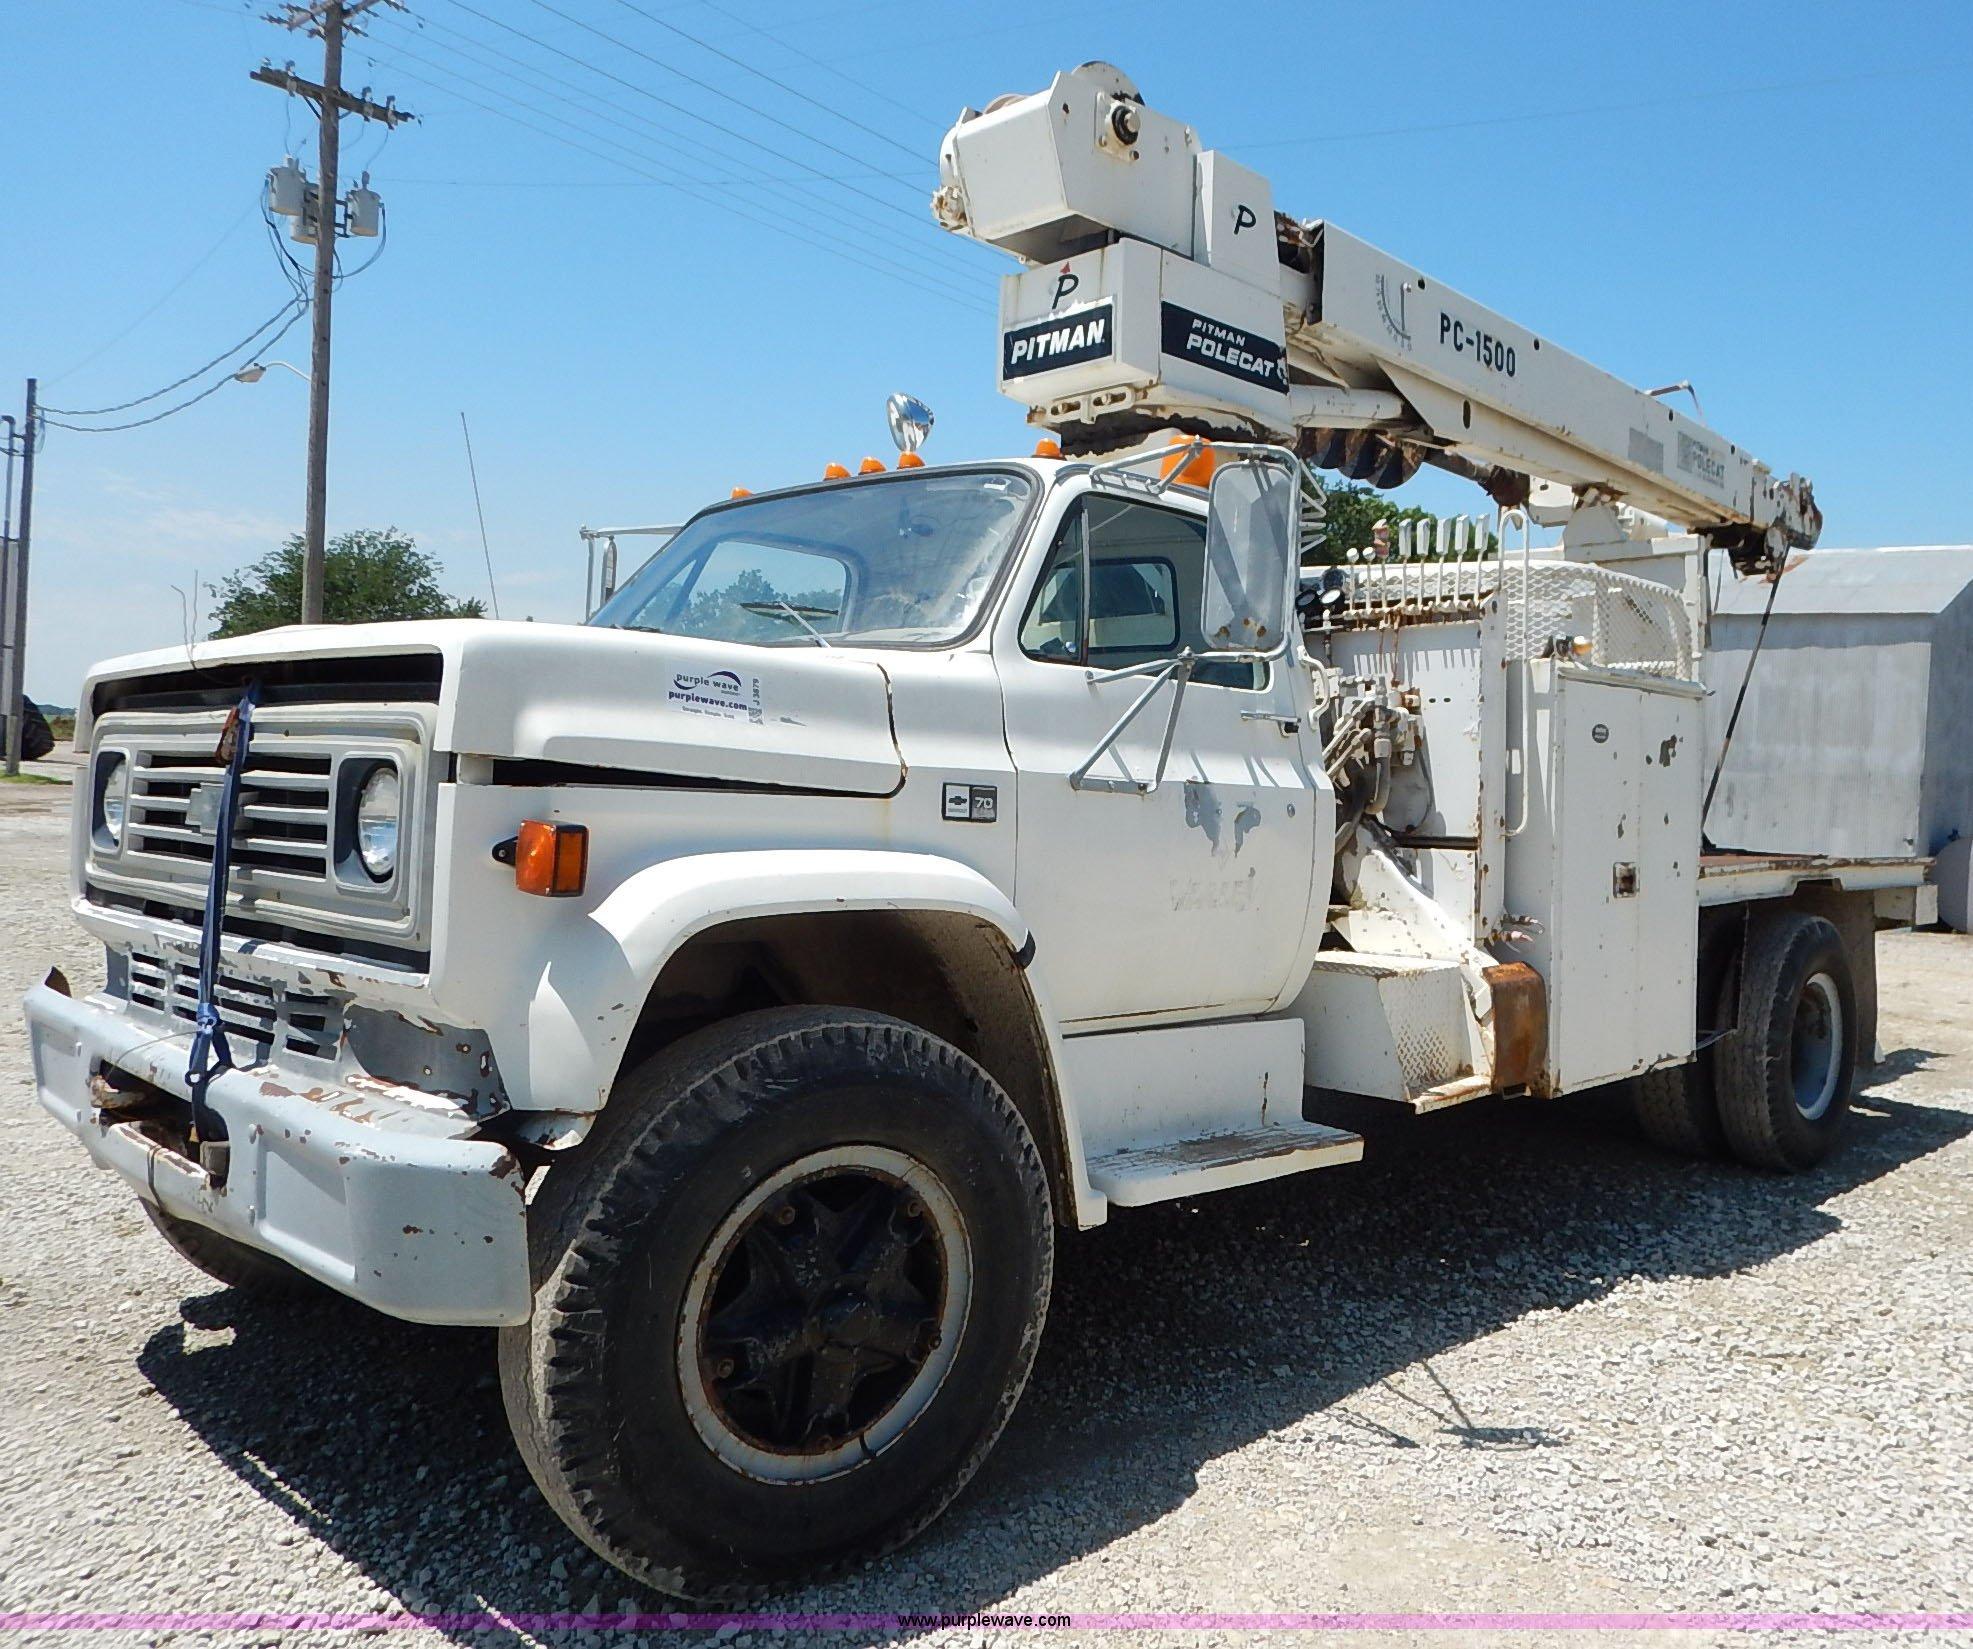 1983 chevrolet kodiak derrick digger truck item j3879 so rh purplewave com Pitman Valve Pitman Boom Parts